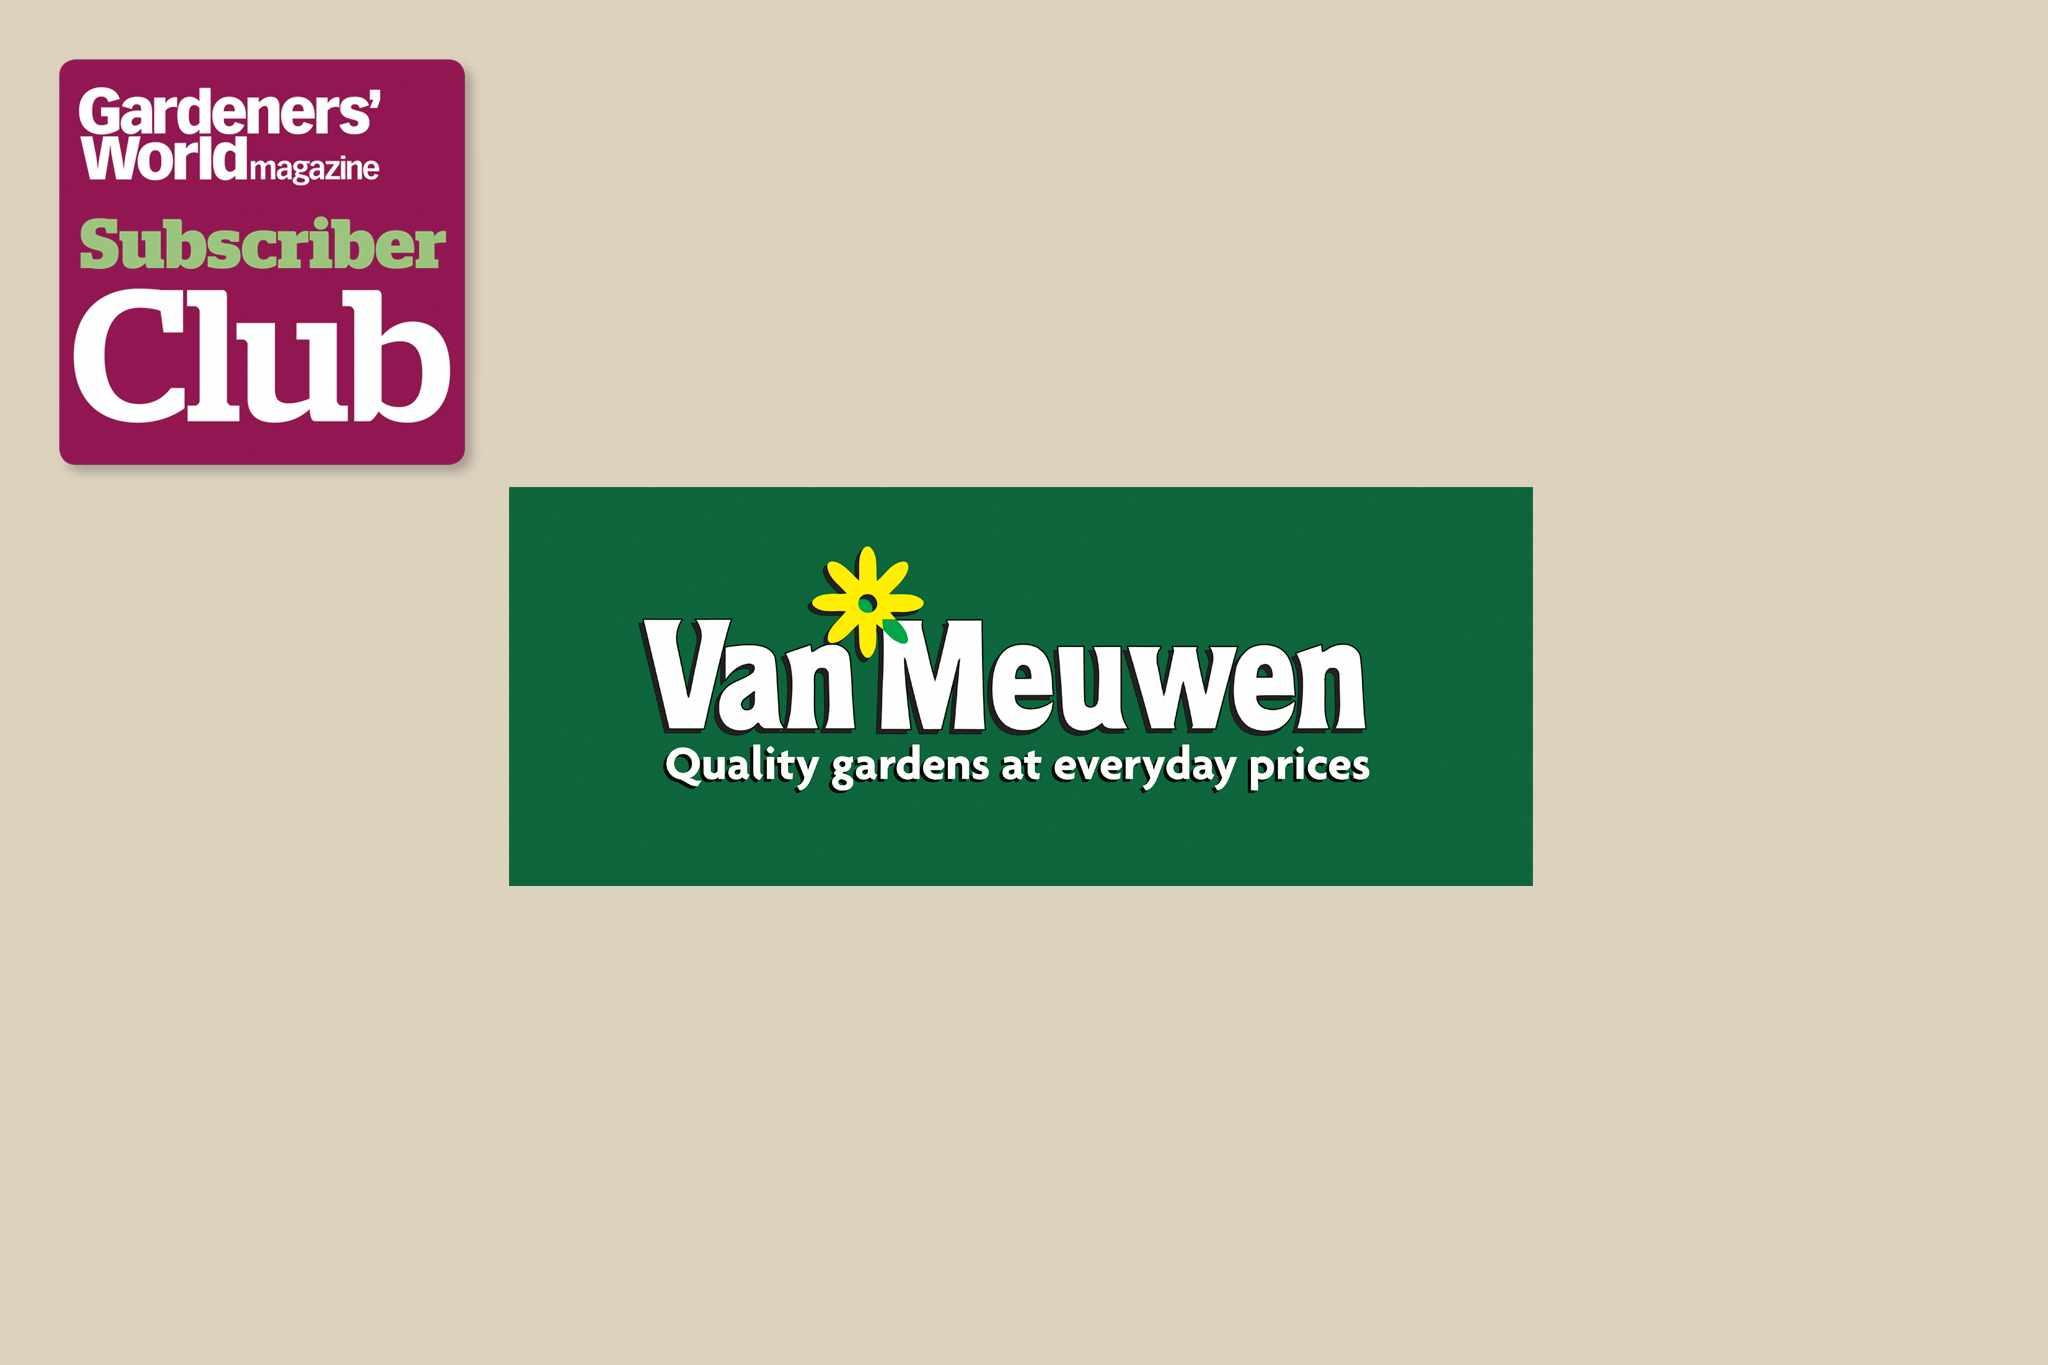 Van Meuwen BBC Gardeners' World Magazine Subscriber Club discount